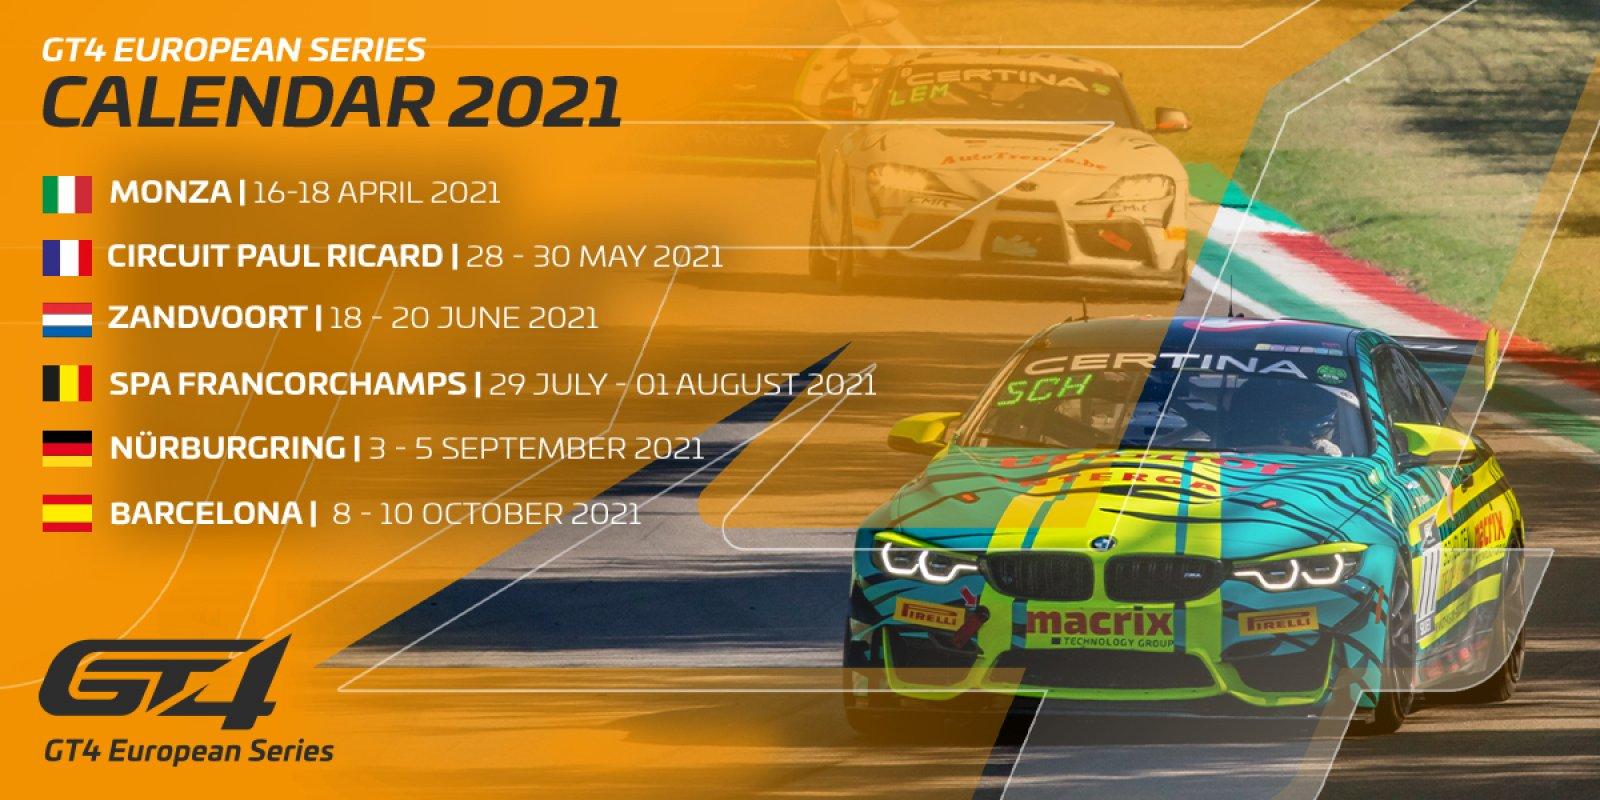 GT4 European Series reveals provisional calendar for 2021 campaign